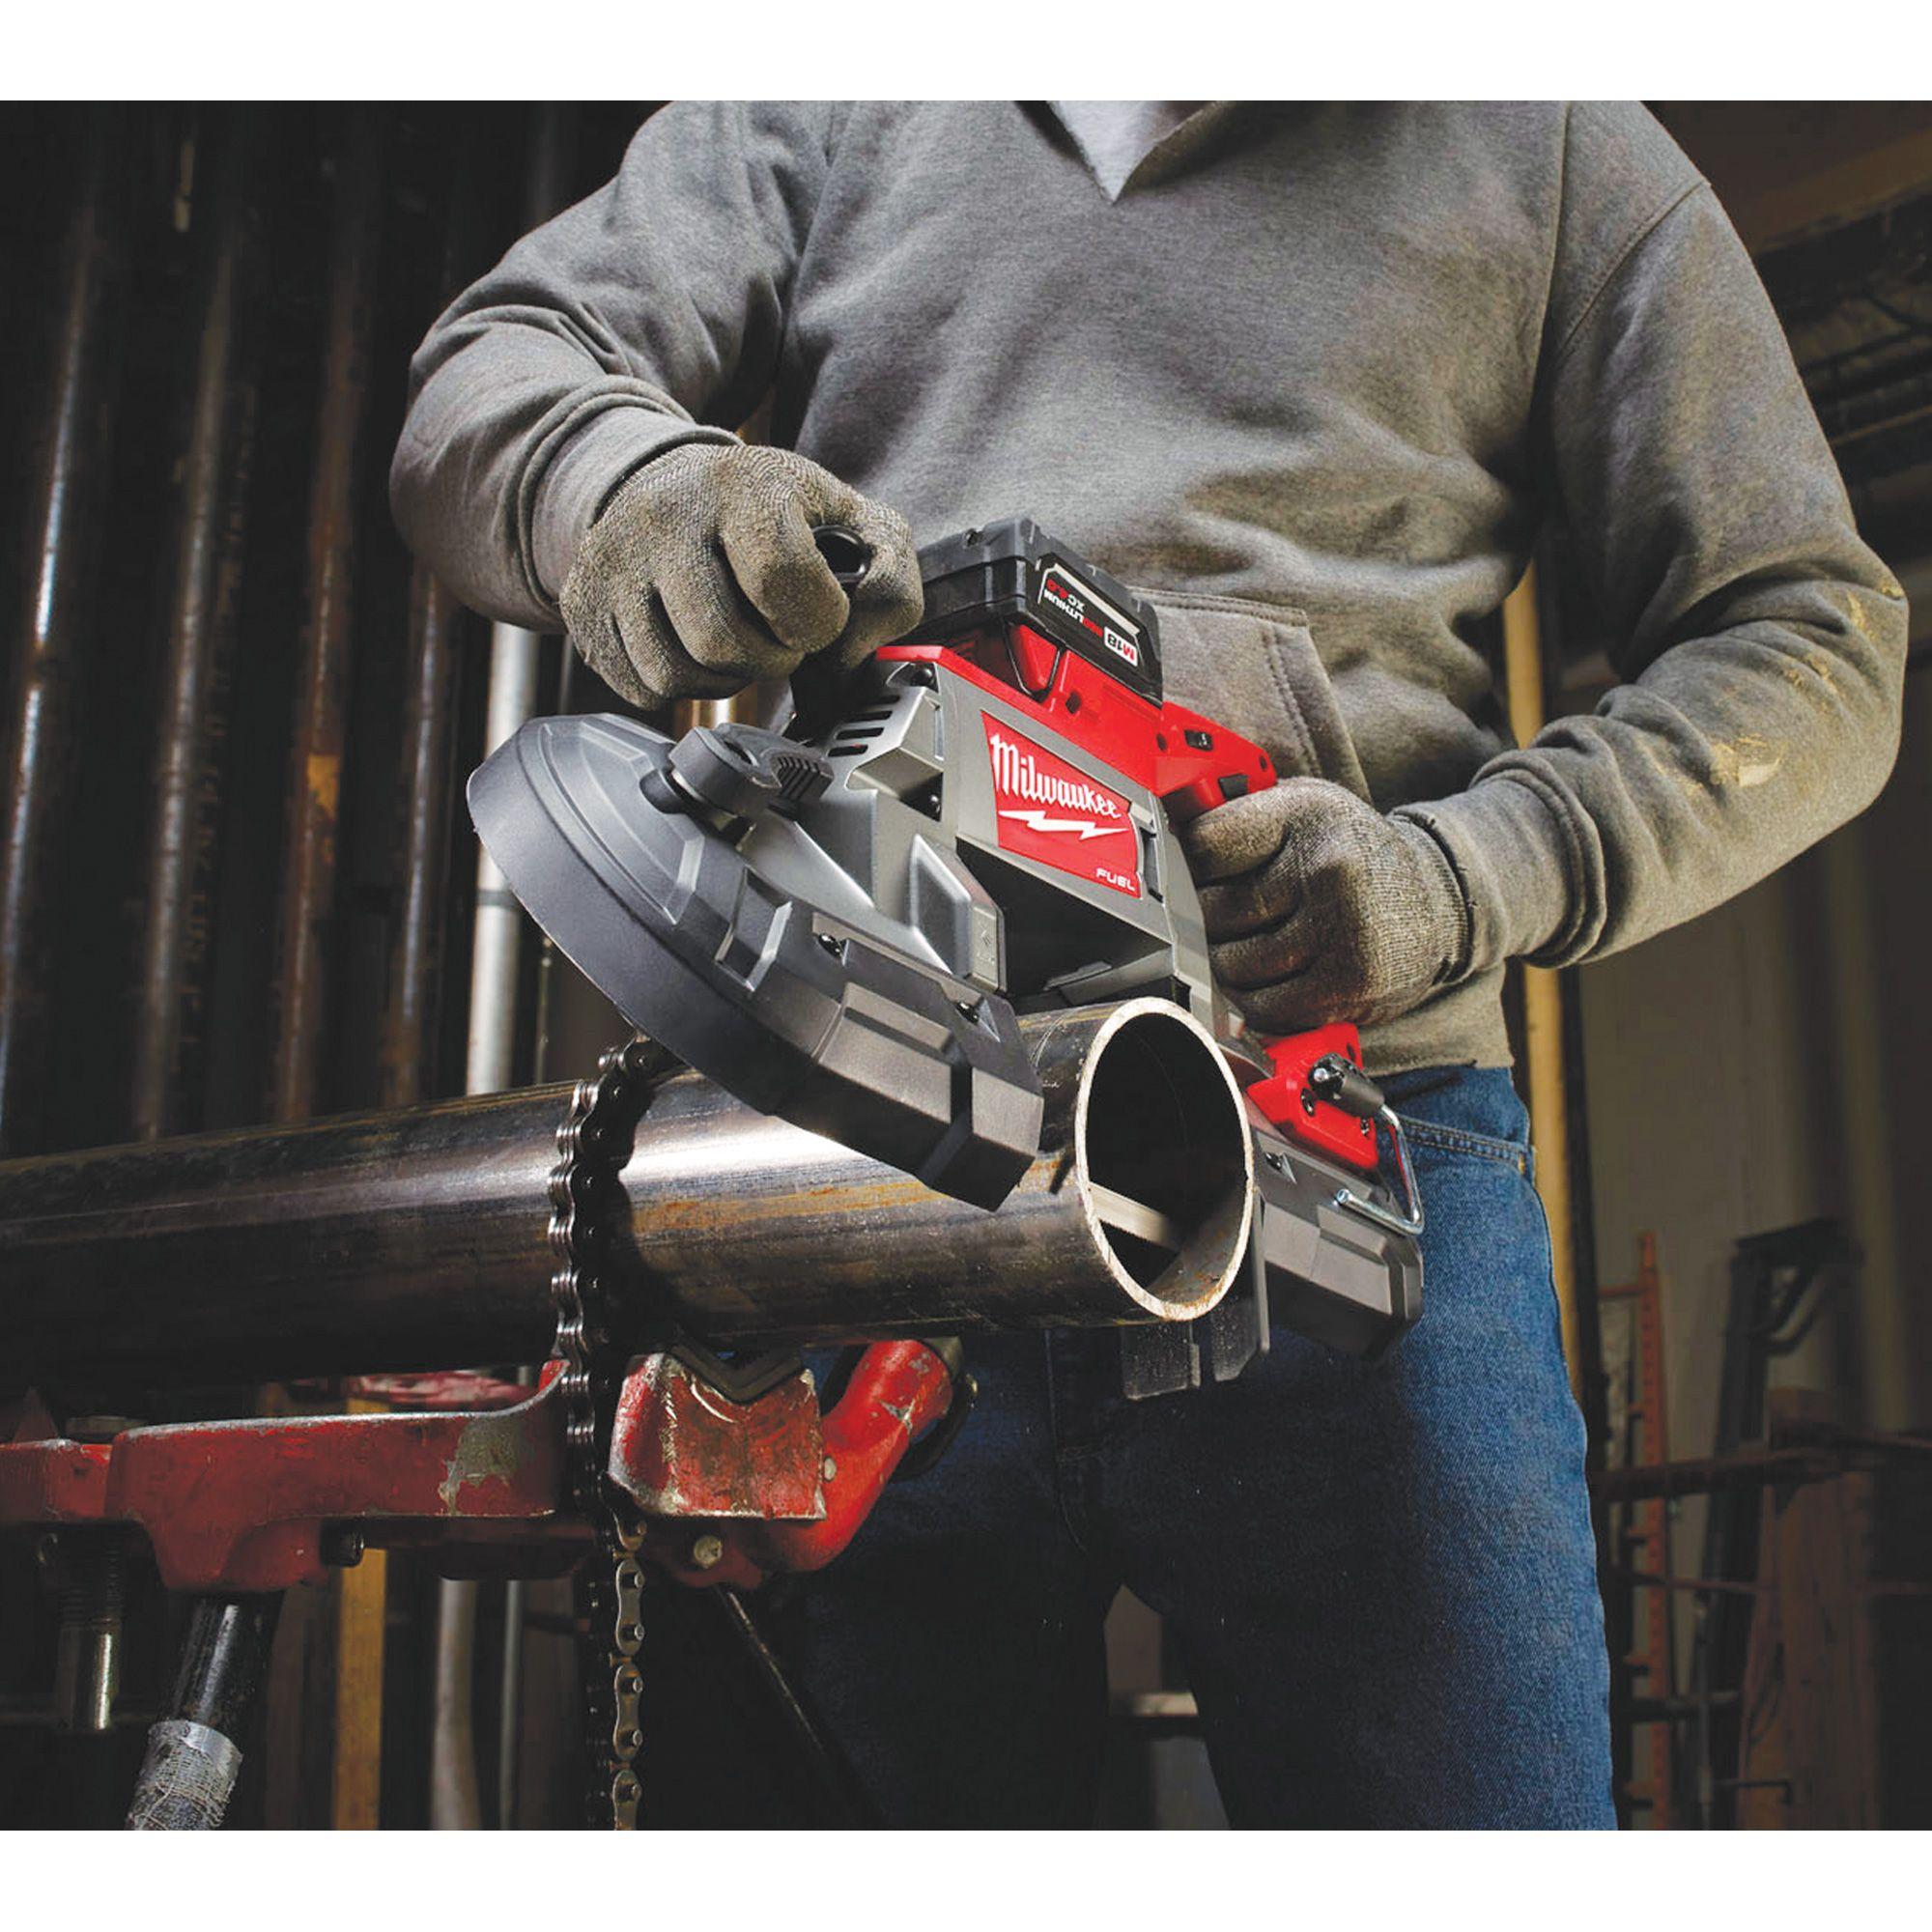 Milwaukee M18 FUEL Cordless Deep Cut Band Saw Kit 18 Volt